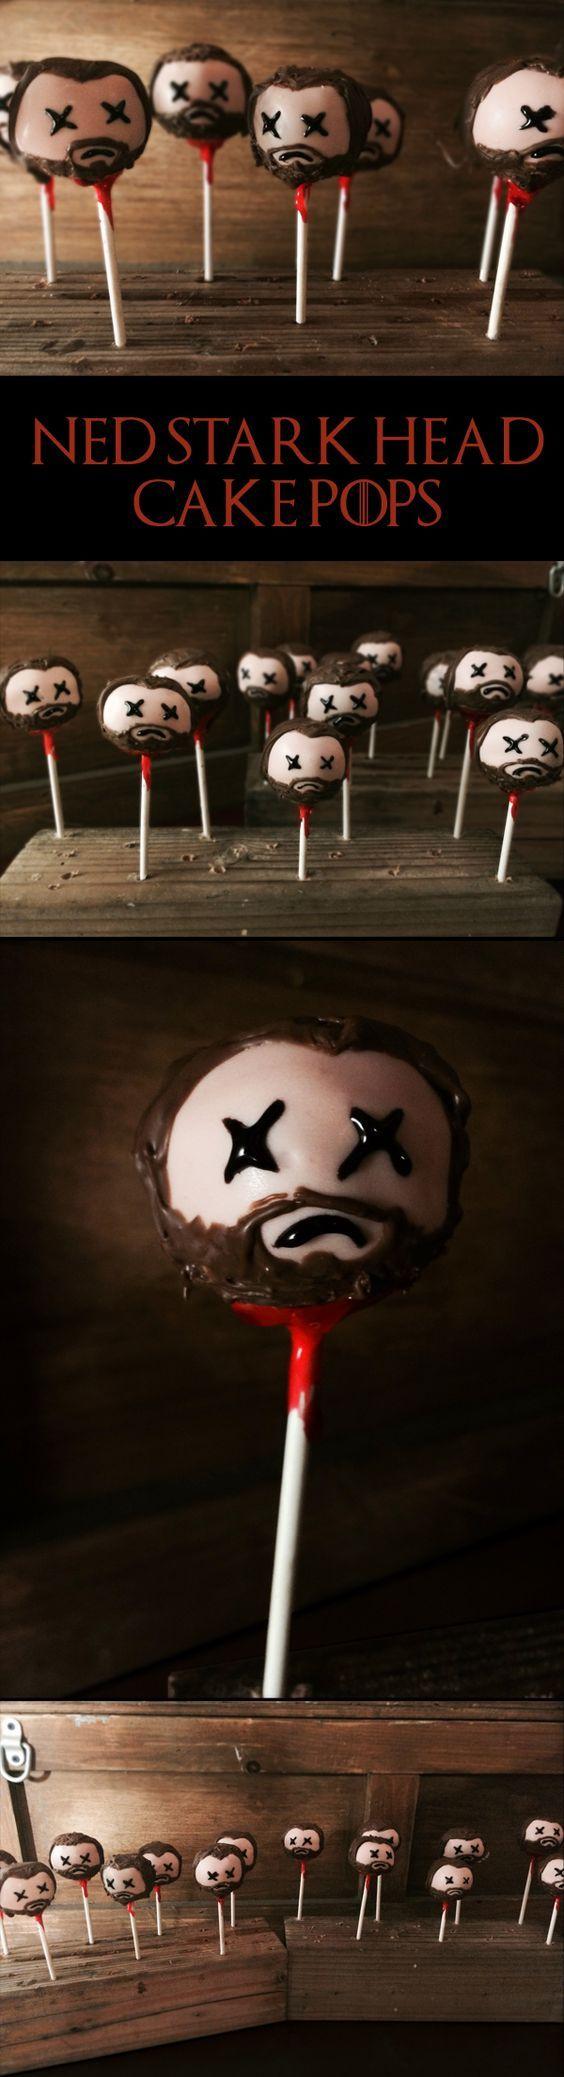 My Ned Stark head Game of Thrones cake pops!